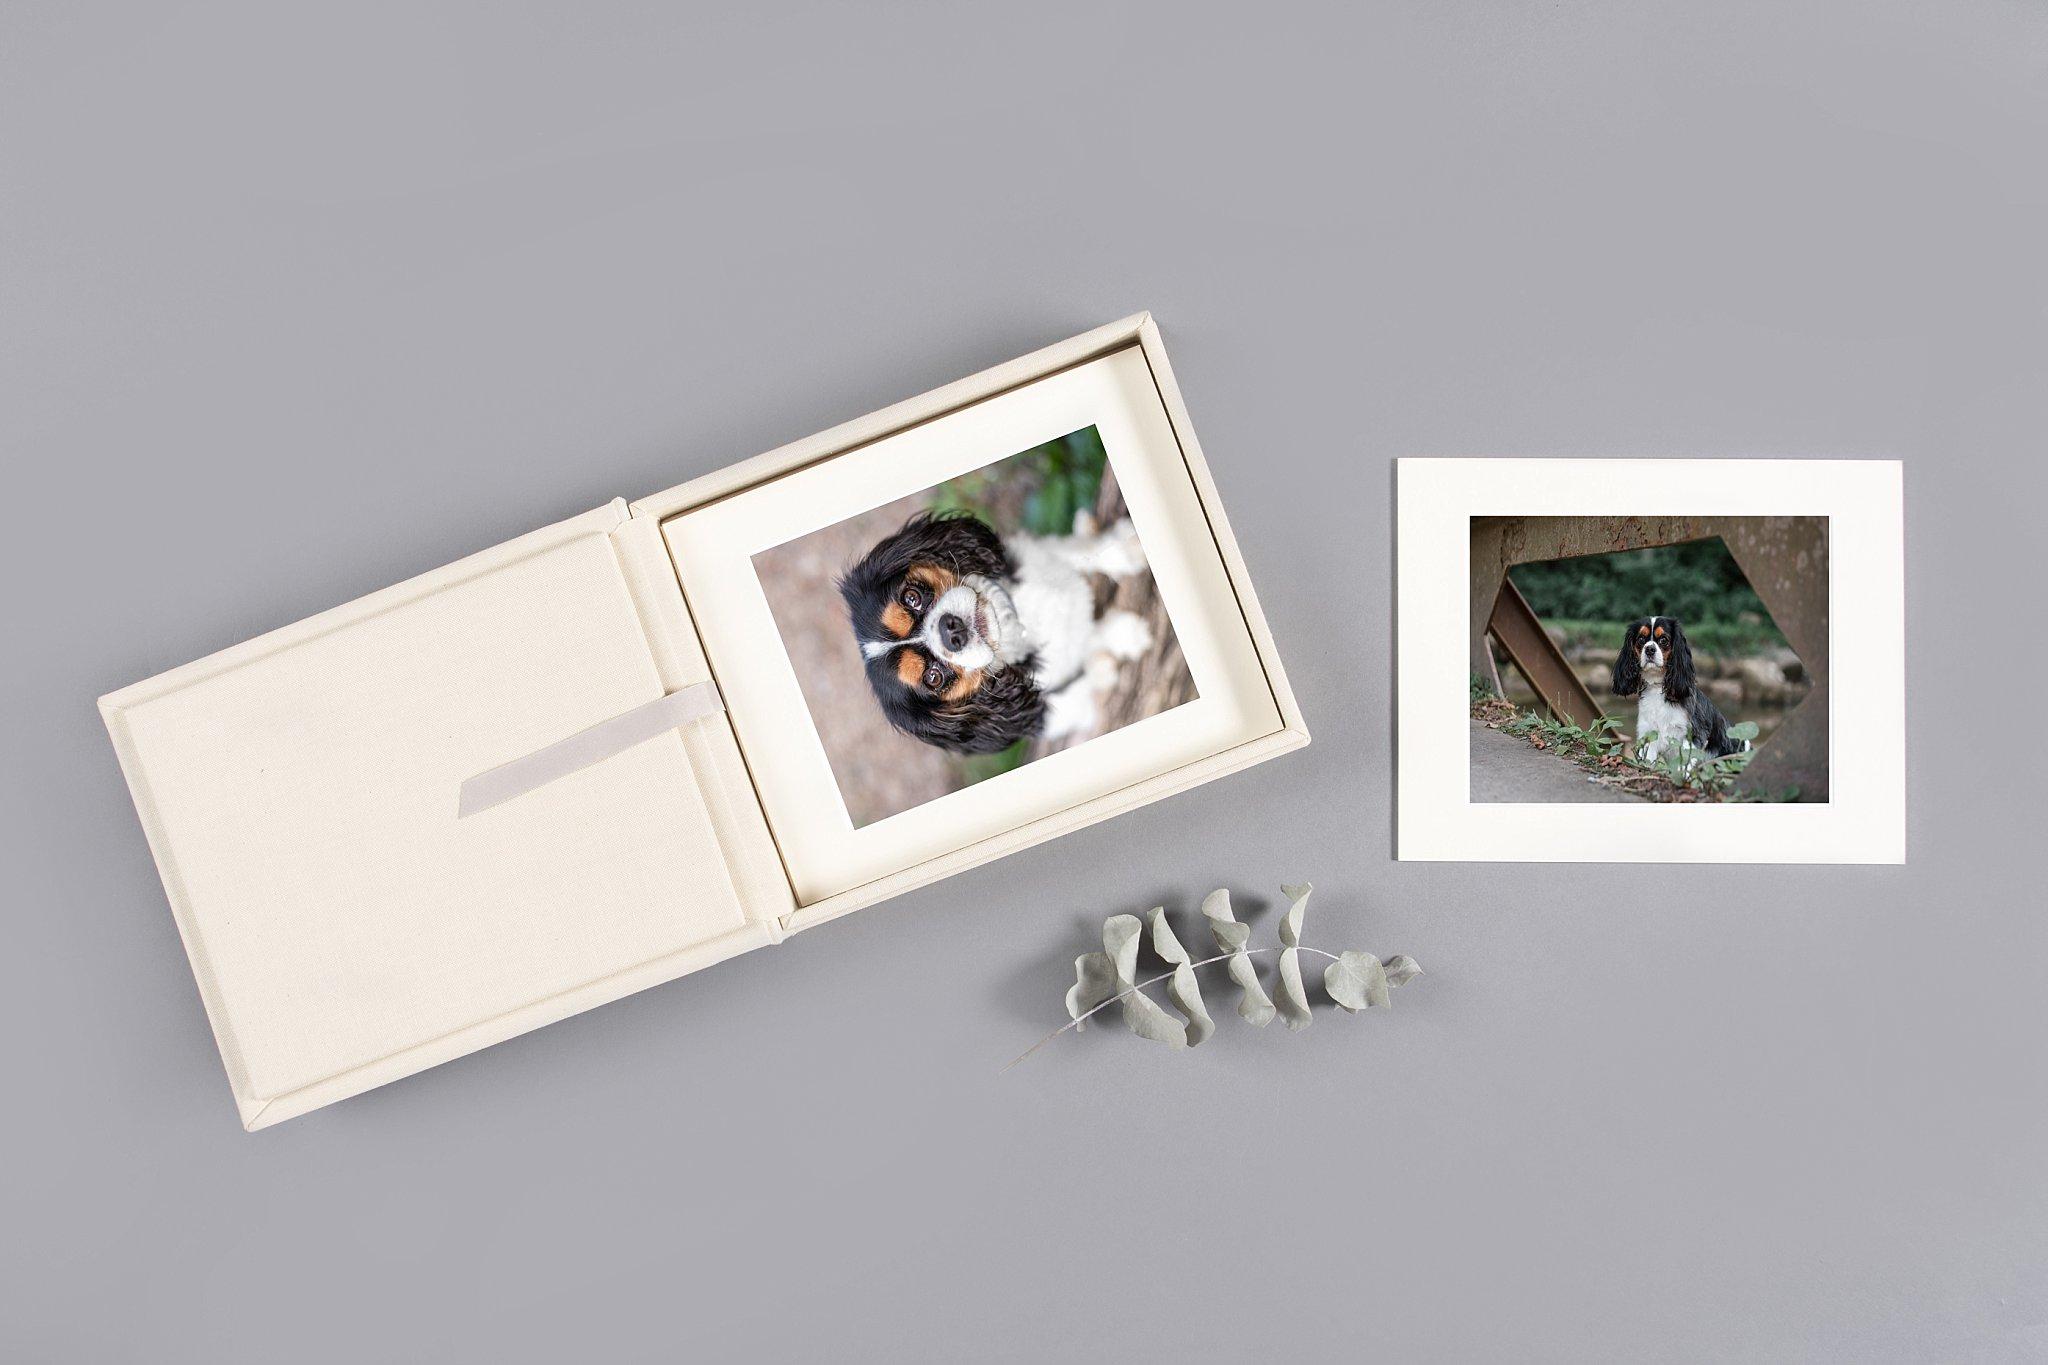 heirloom folio box in an off-white luxury linen